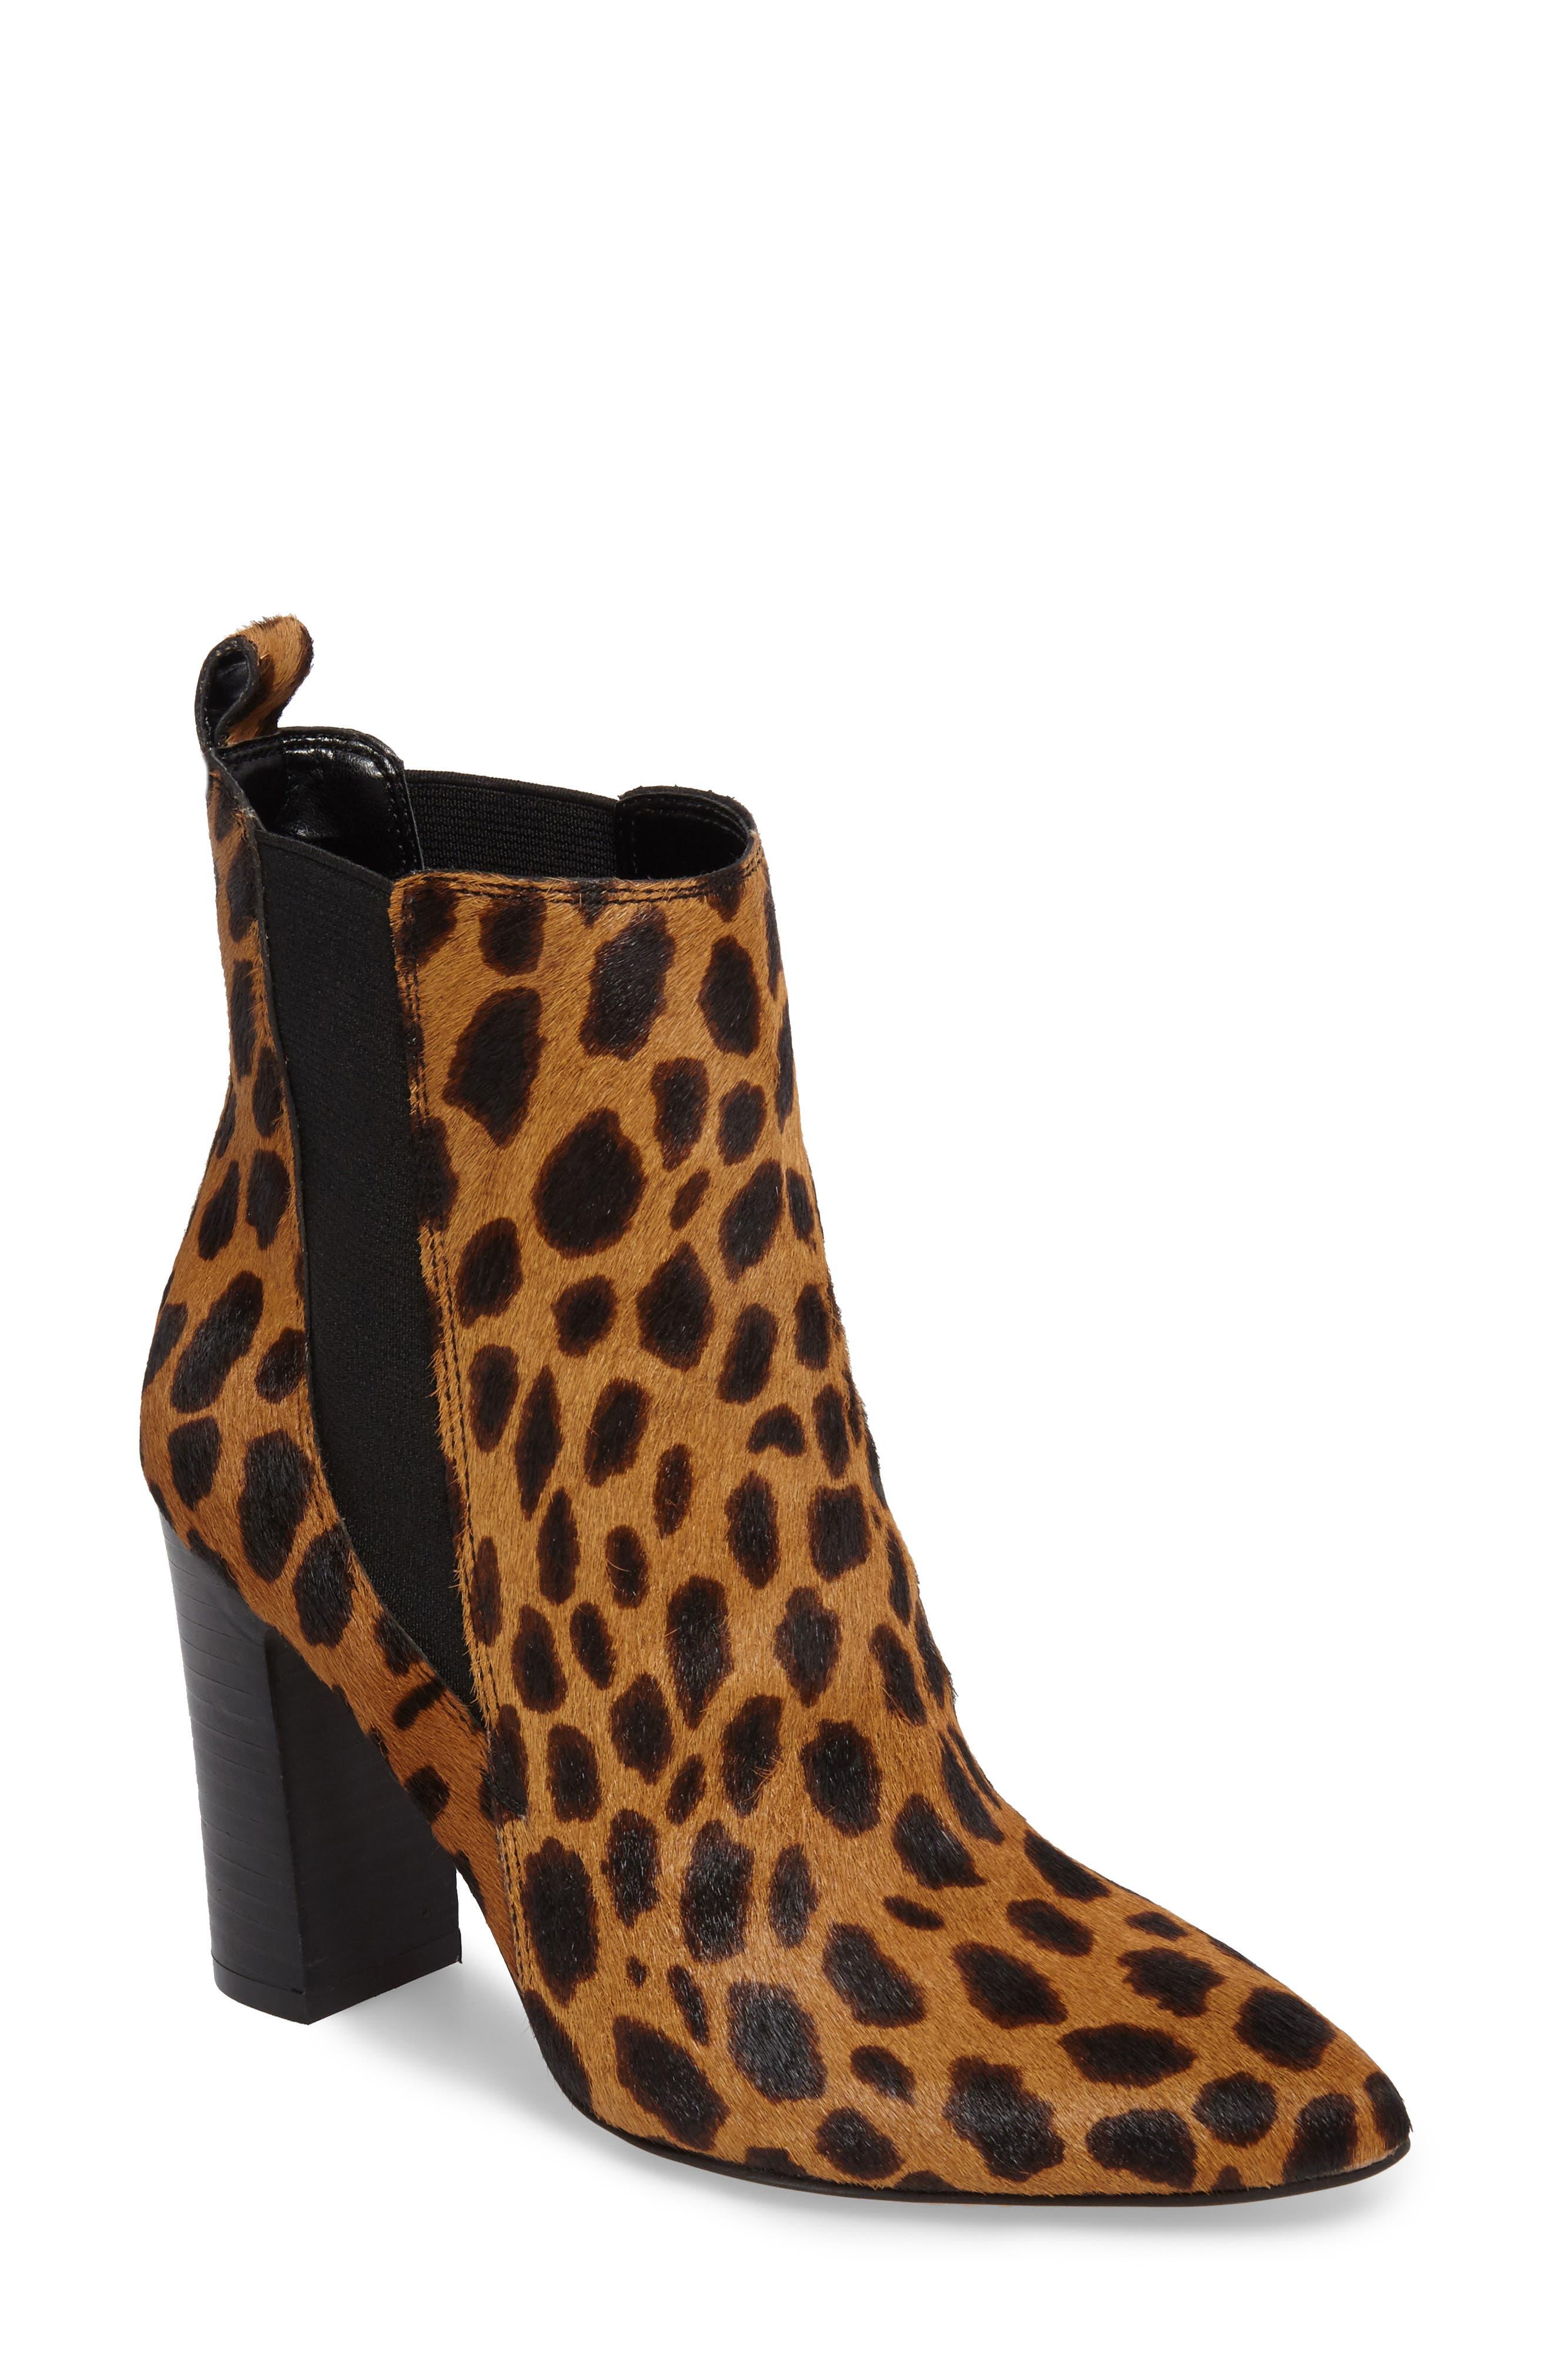 Britsy Bootie,                         Main,                         color, Leopard Calf Hair